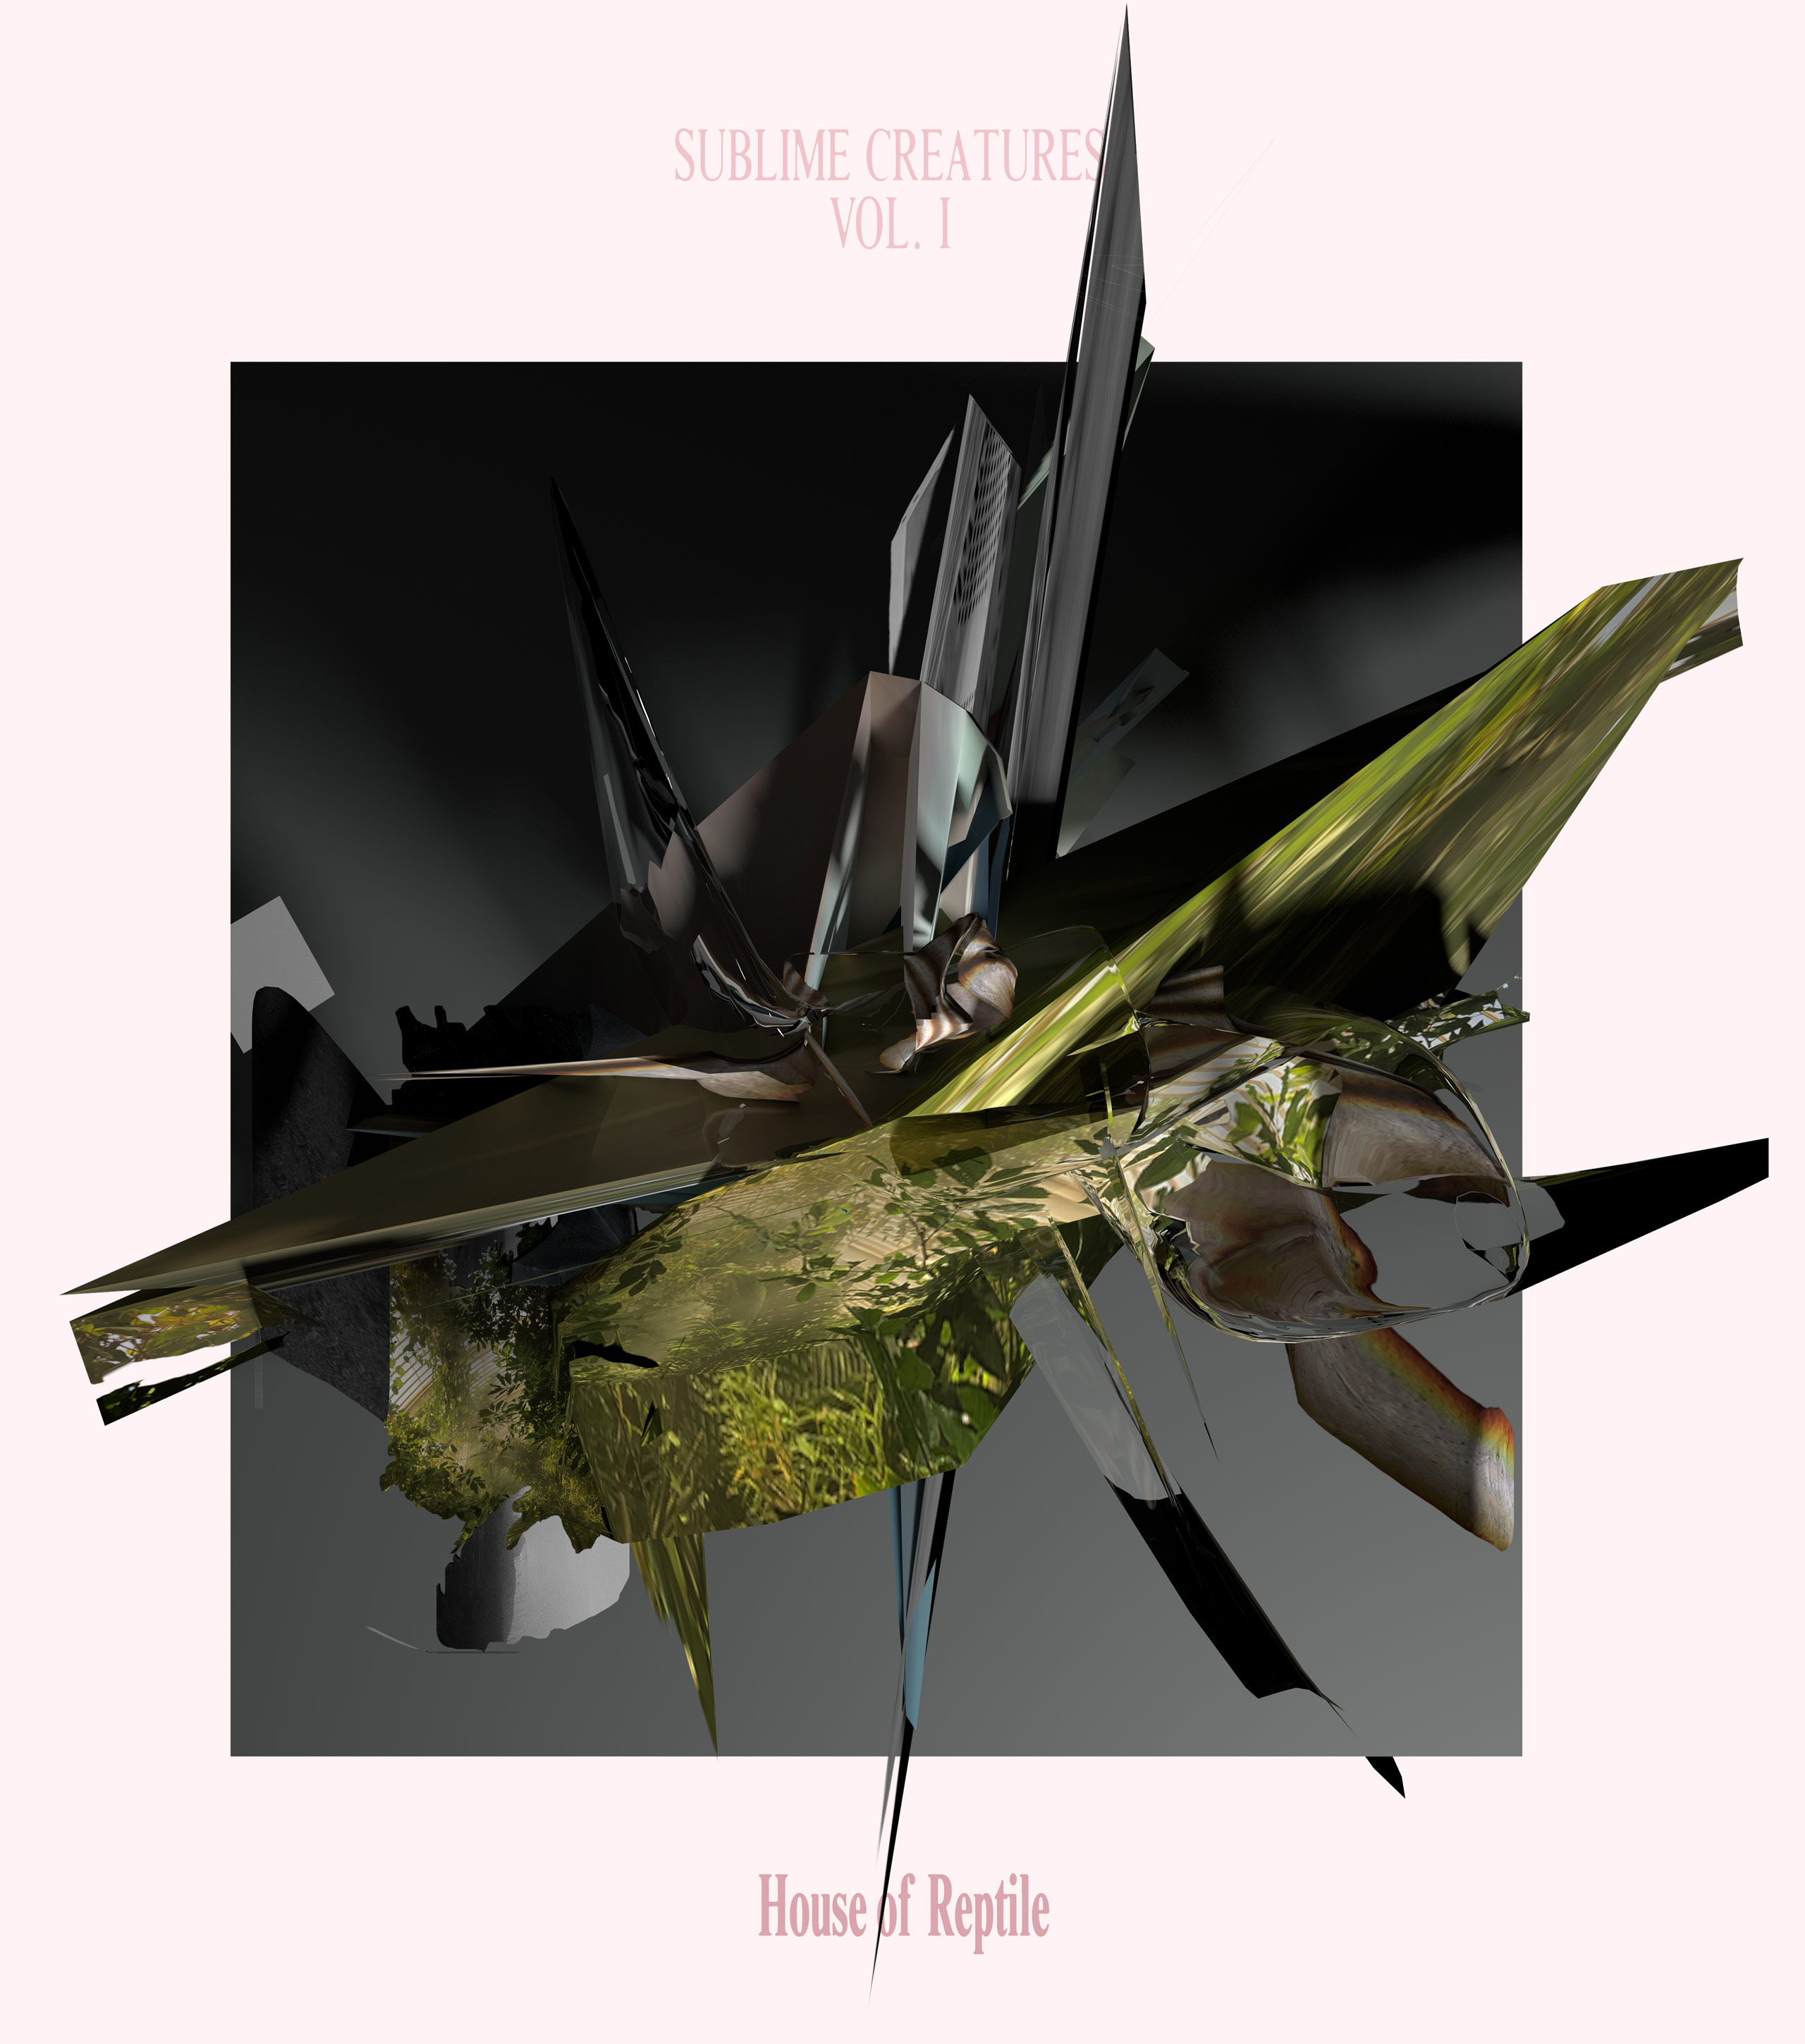 House of Reptile - Sublime Creators - Album Cover